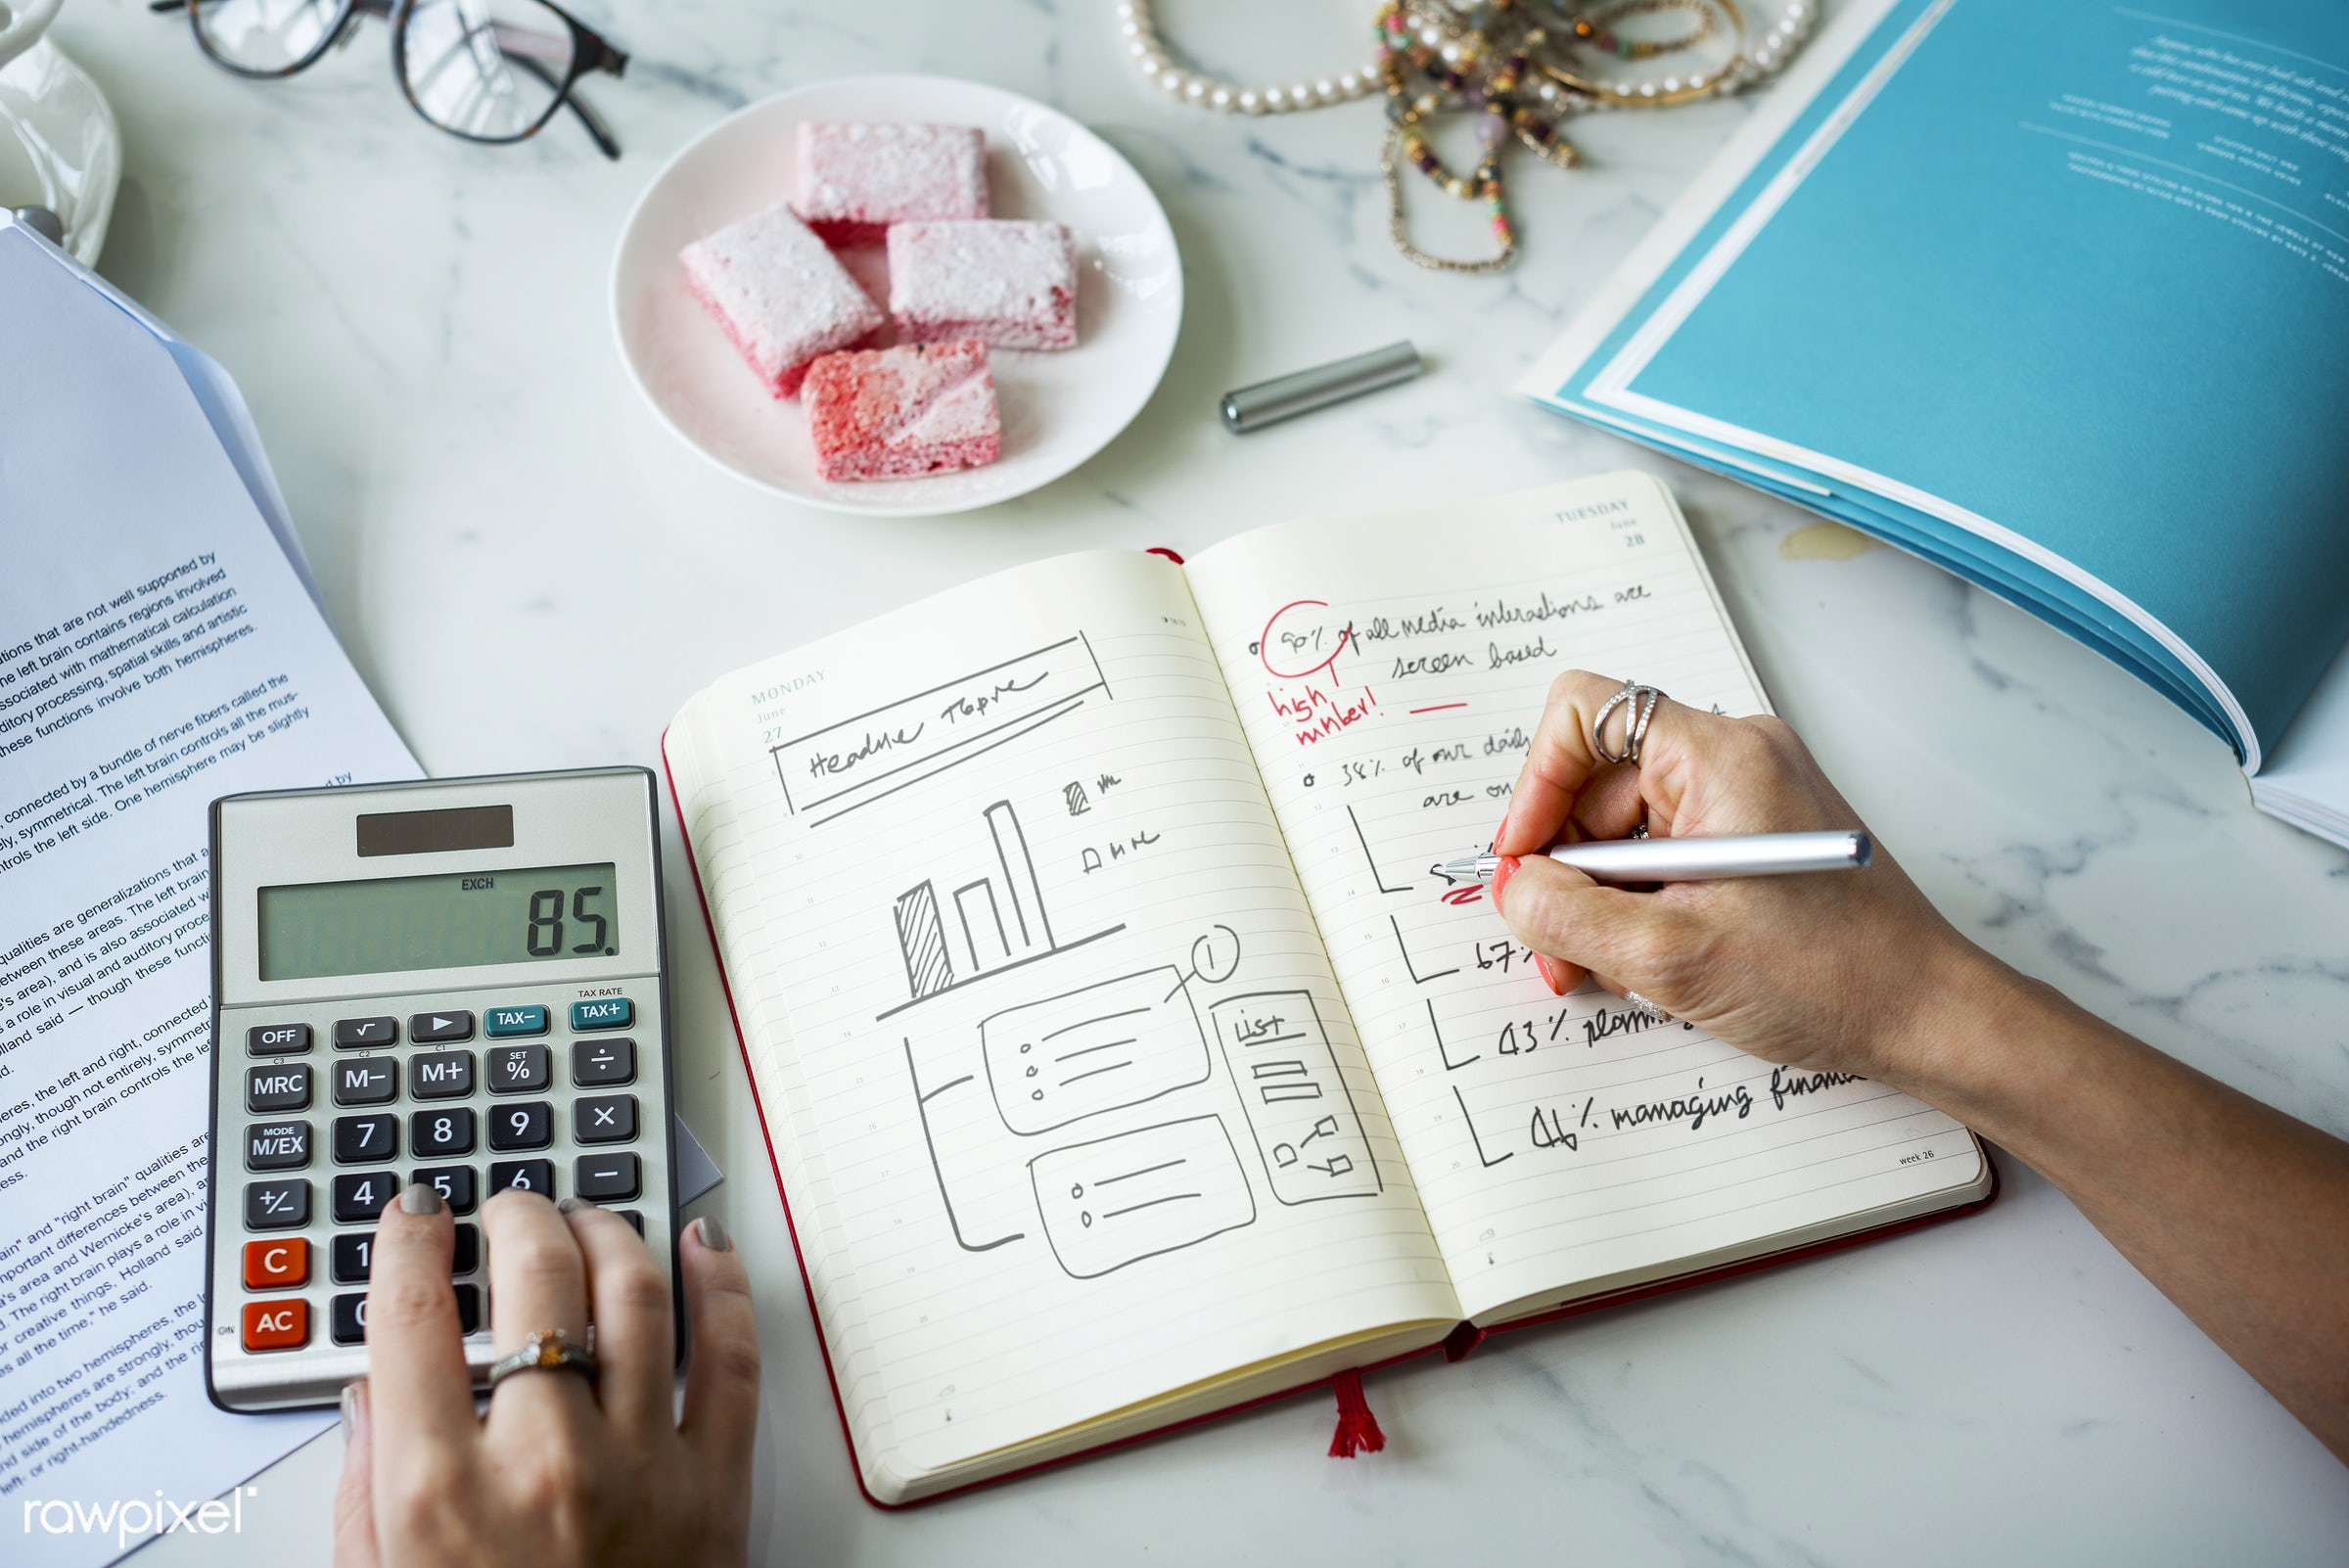 finance, calculator, work, business, plan, note, merchandise, laptop, writing, assistance, calculation, colleague, couple,...